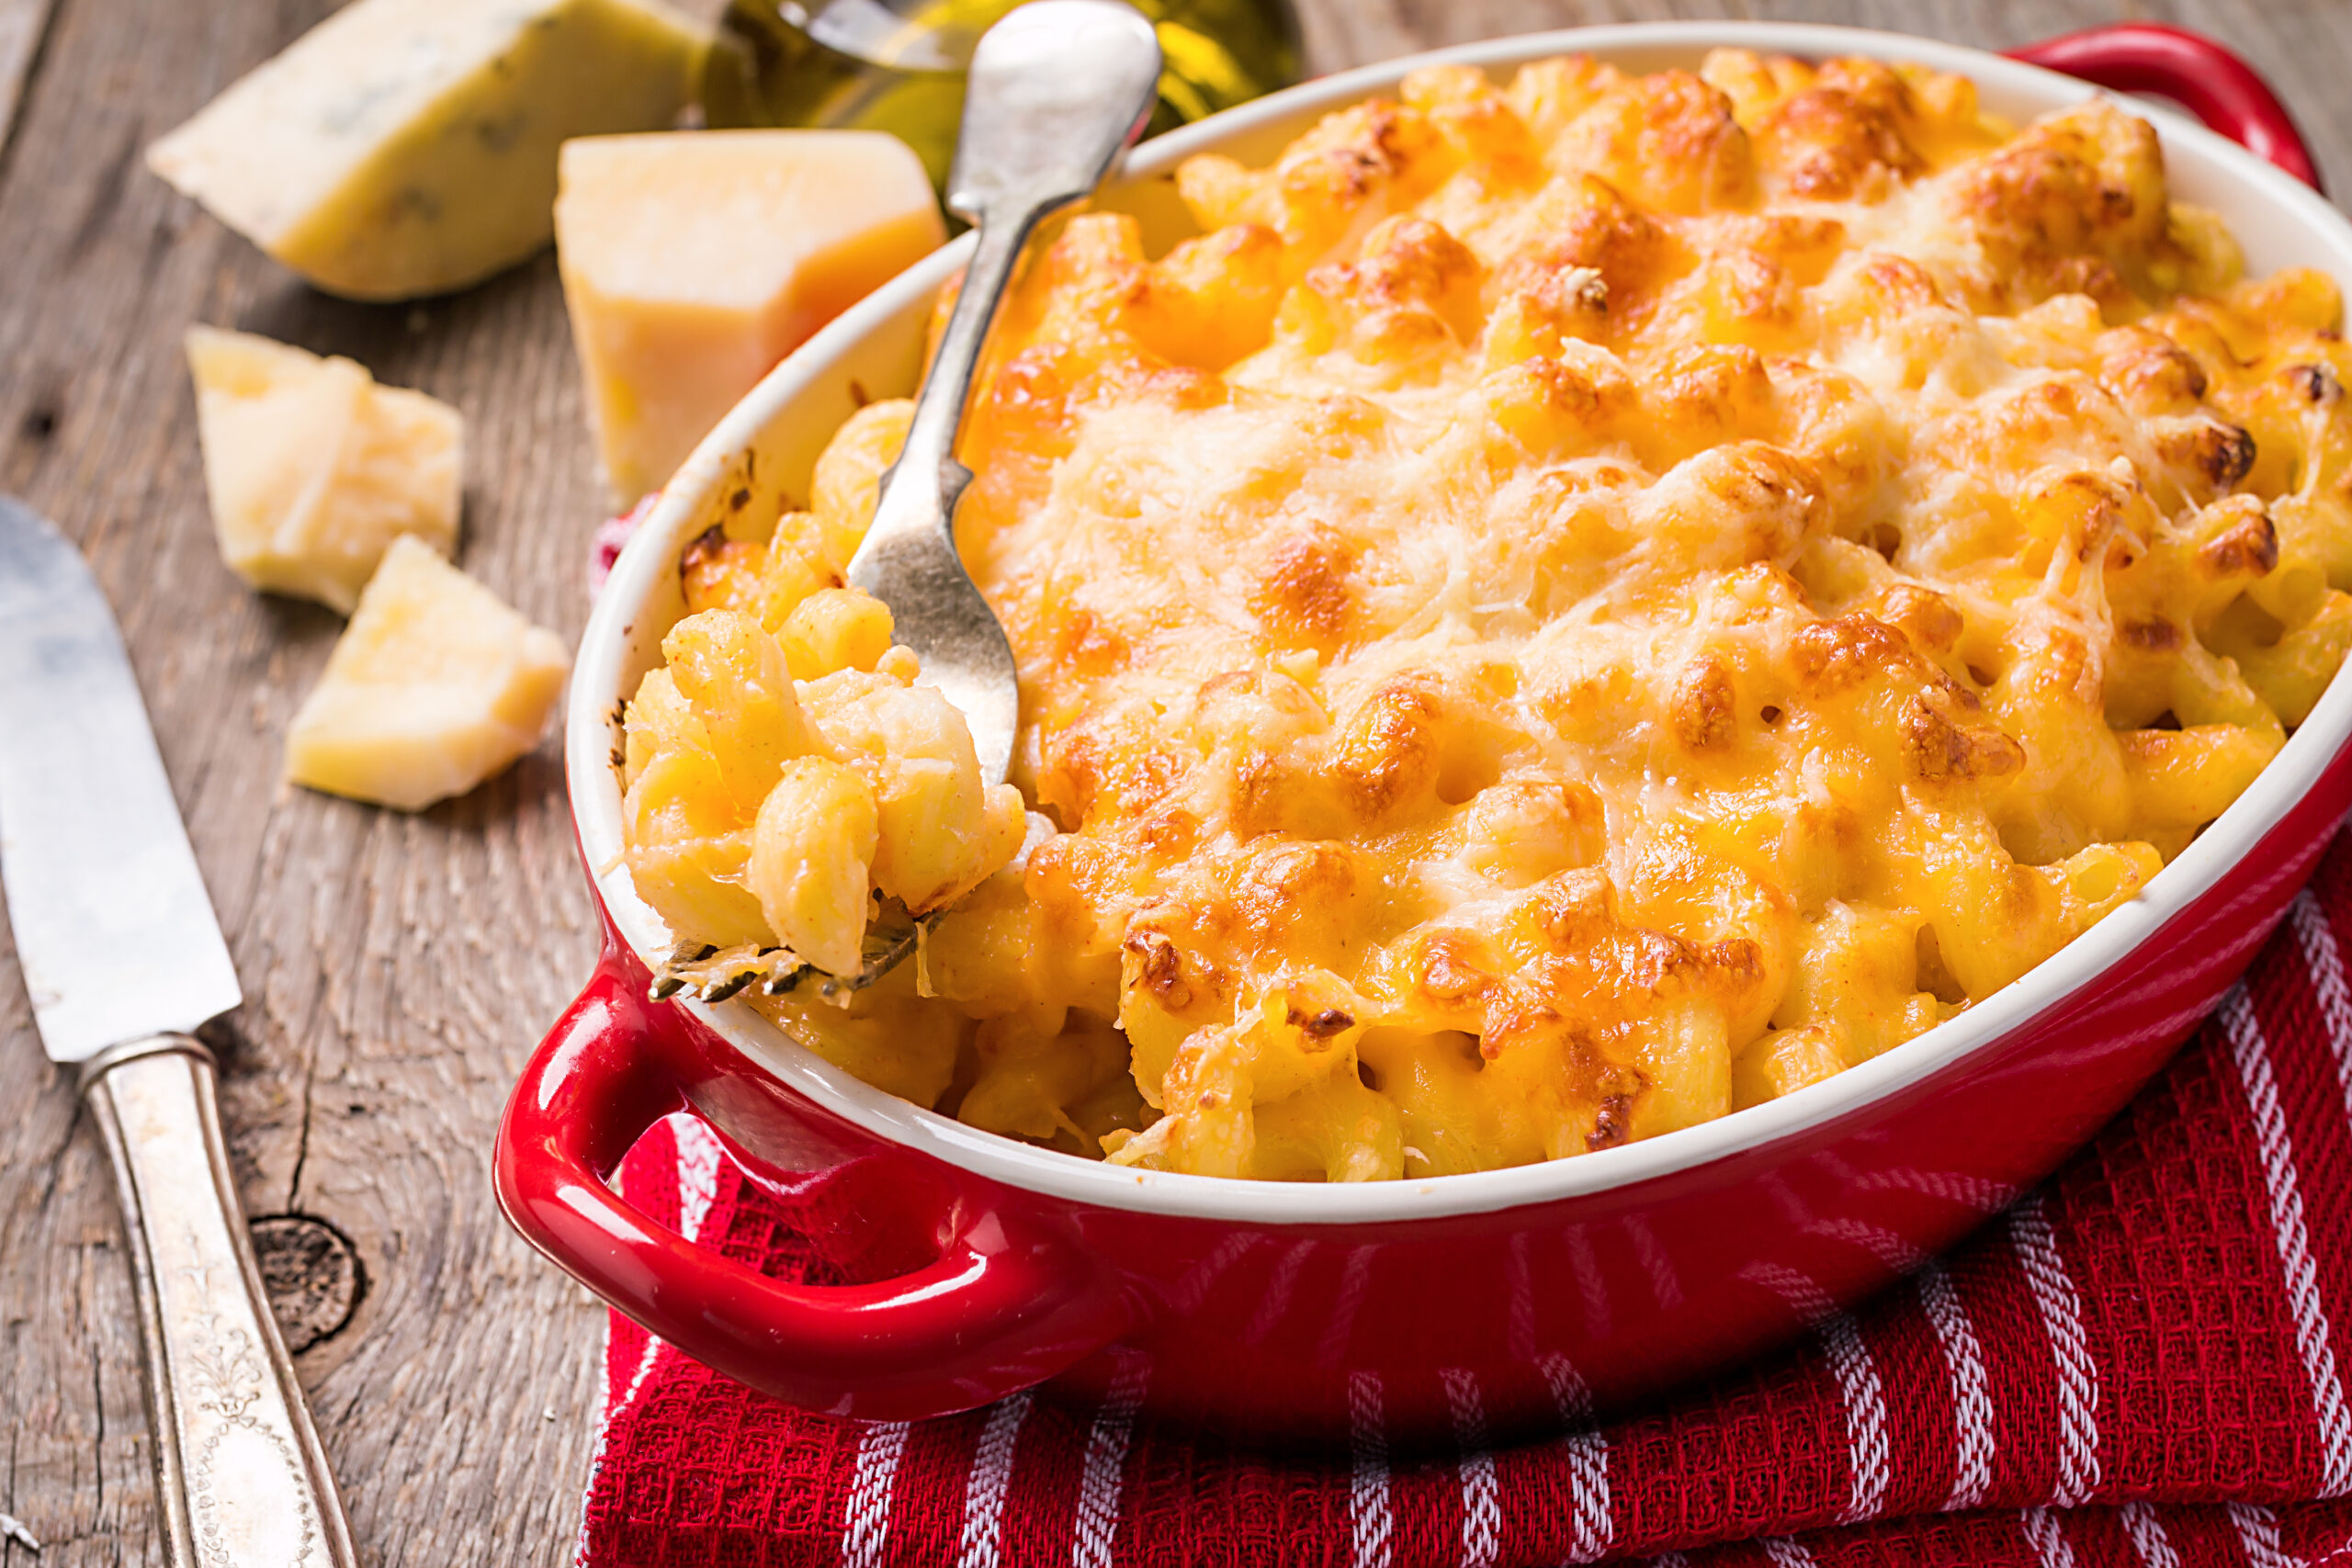 the bomb macaroni and cheese